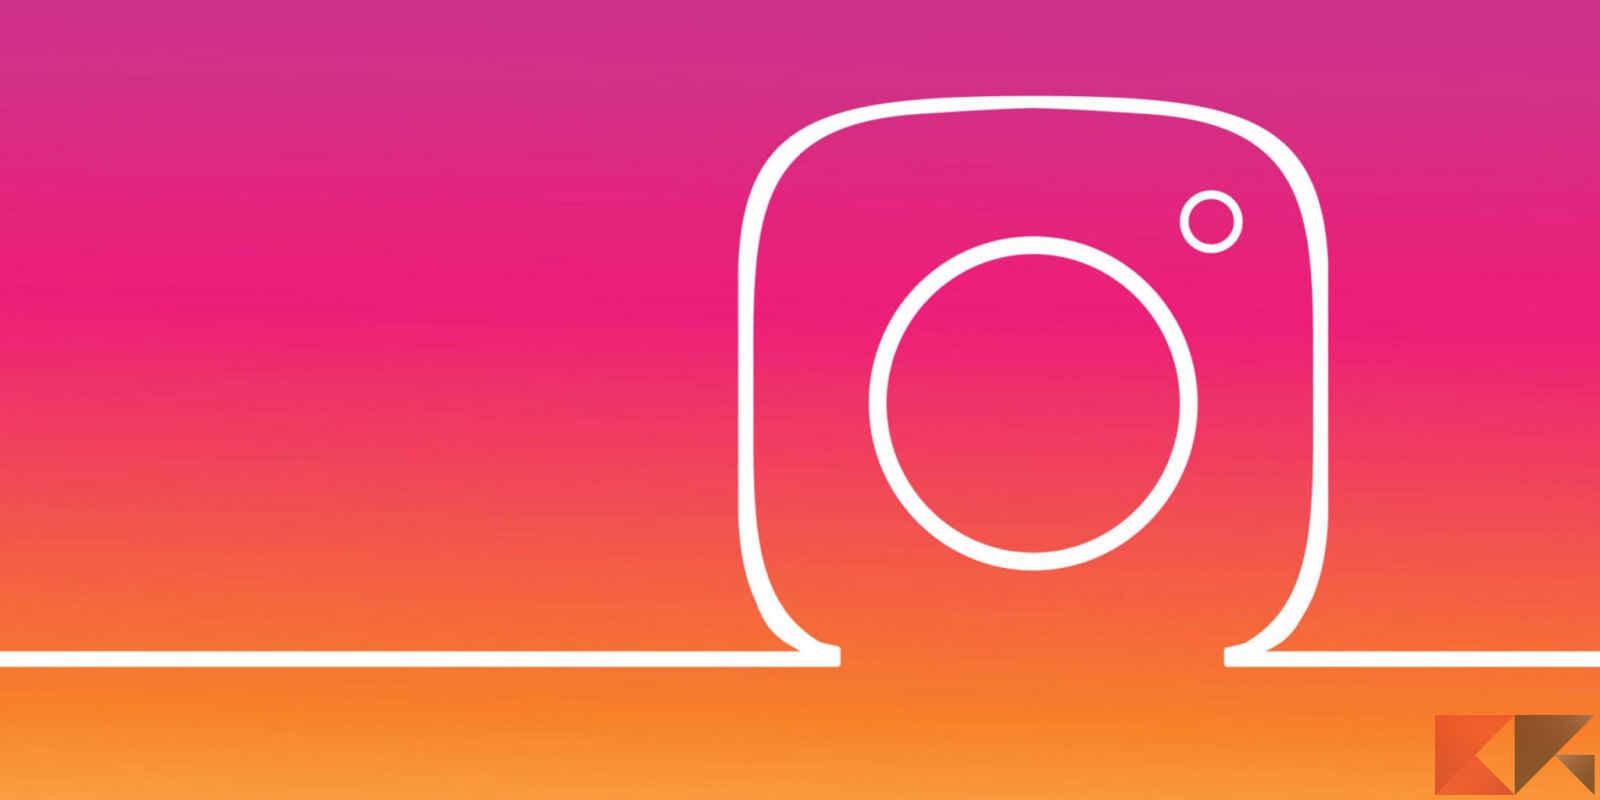 Come recuperare la password di Instagram